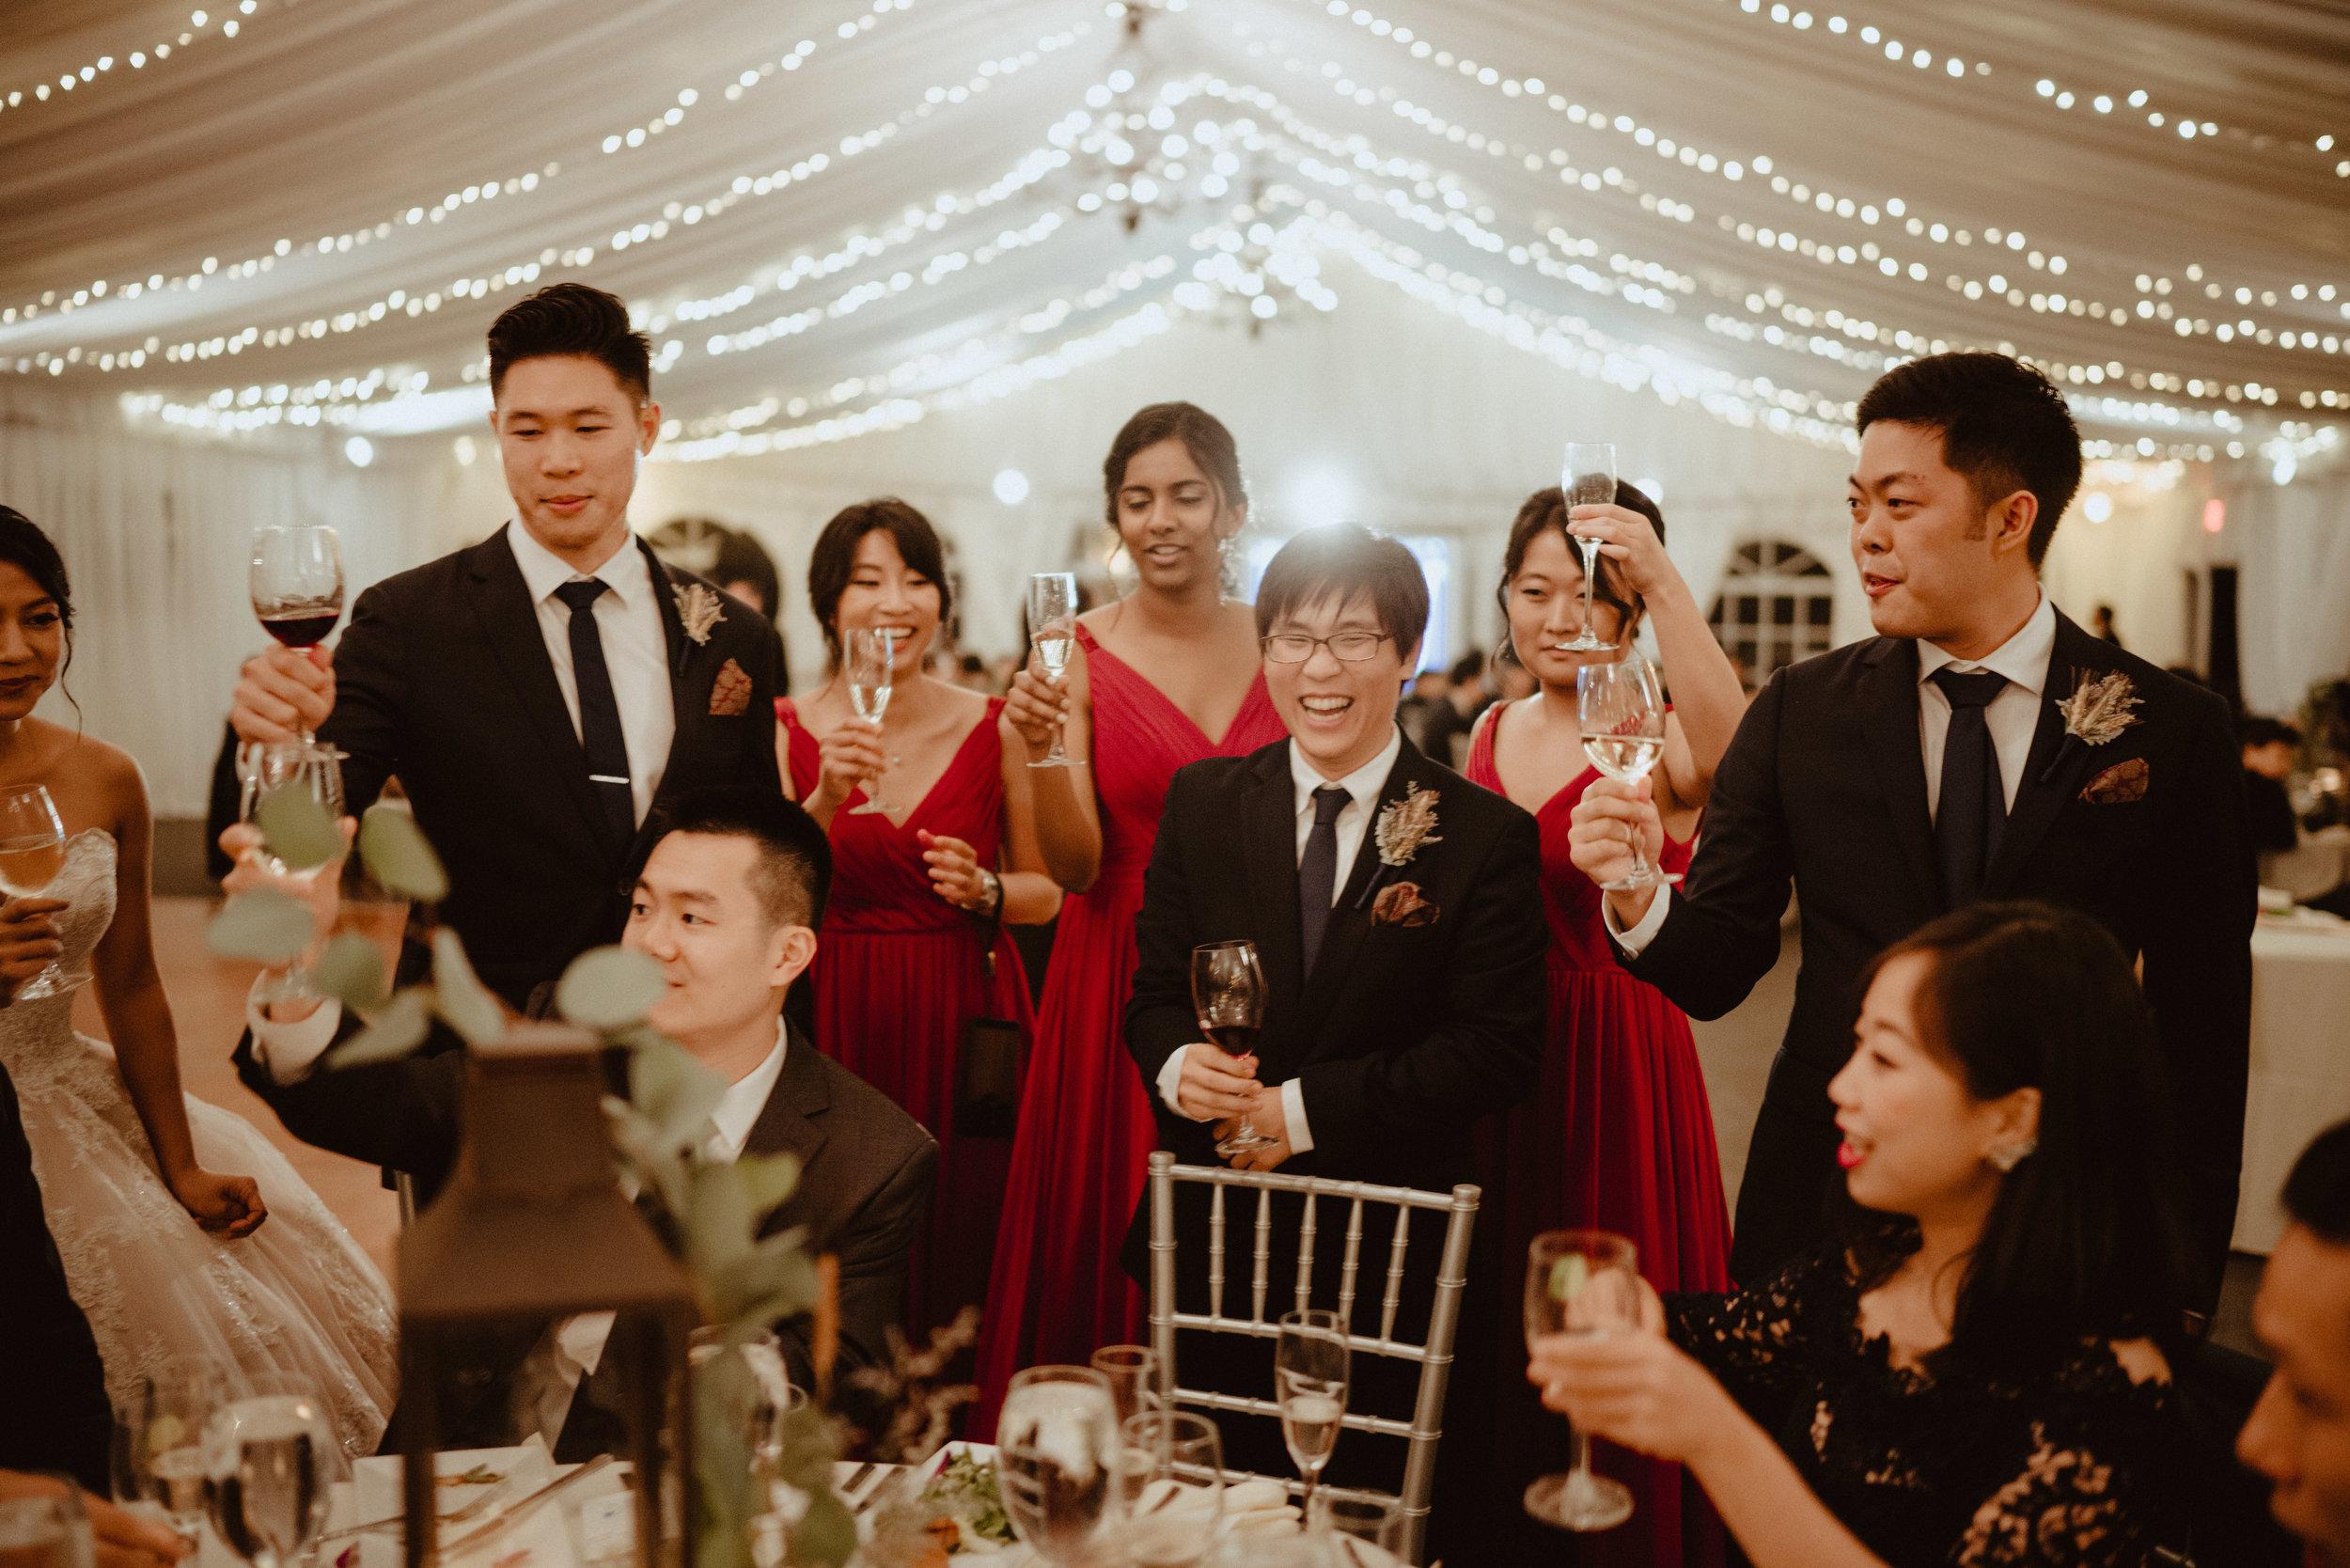 Irene-and-Jae-2019_Brooklyn_Wedding_Photographer_Chellise_Michael_Photography--103.jpg